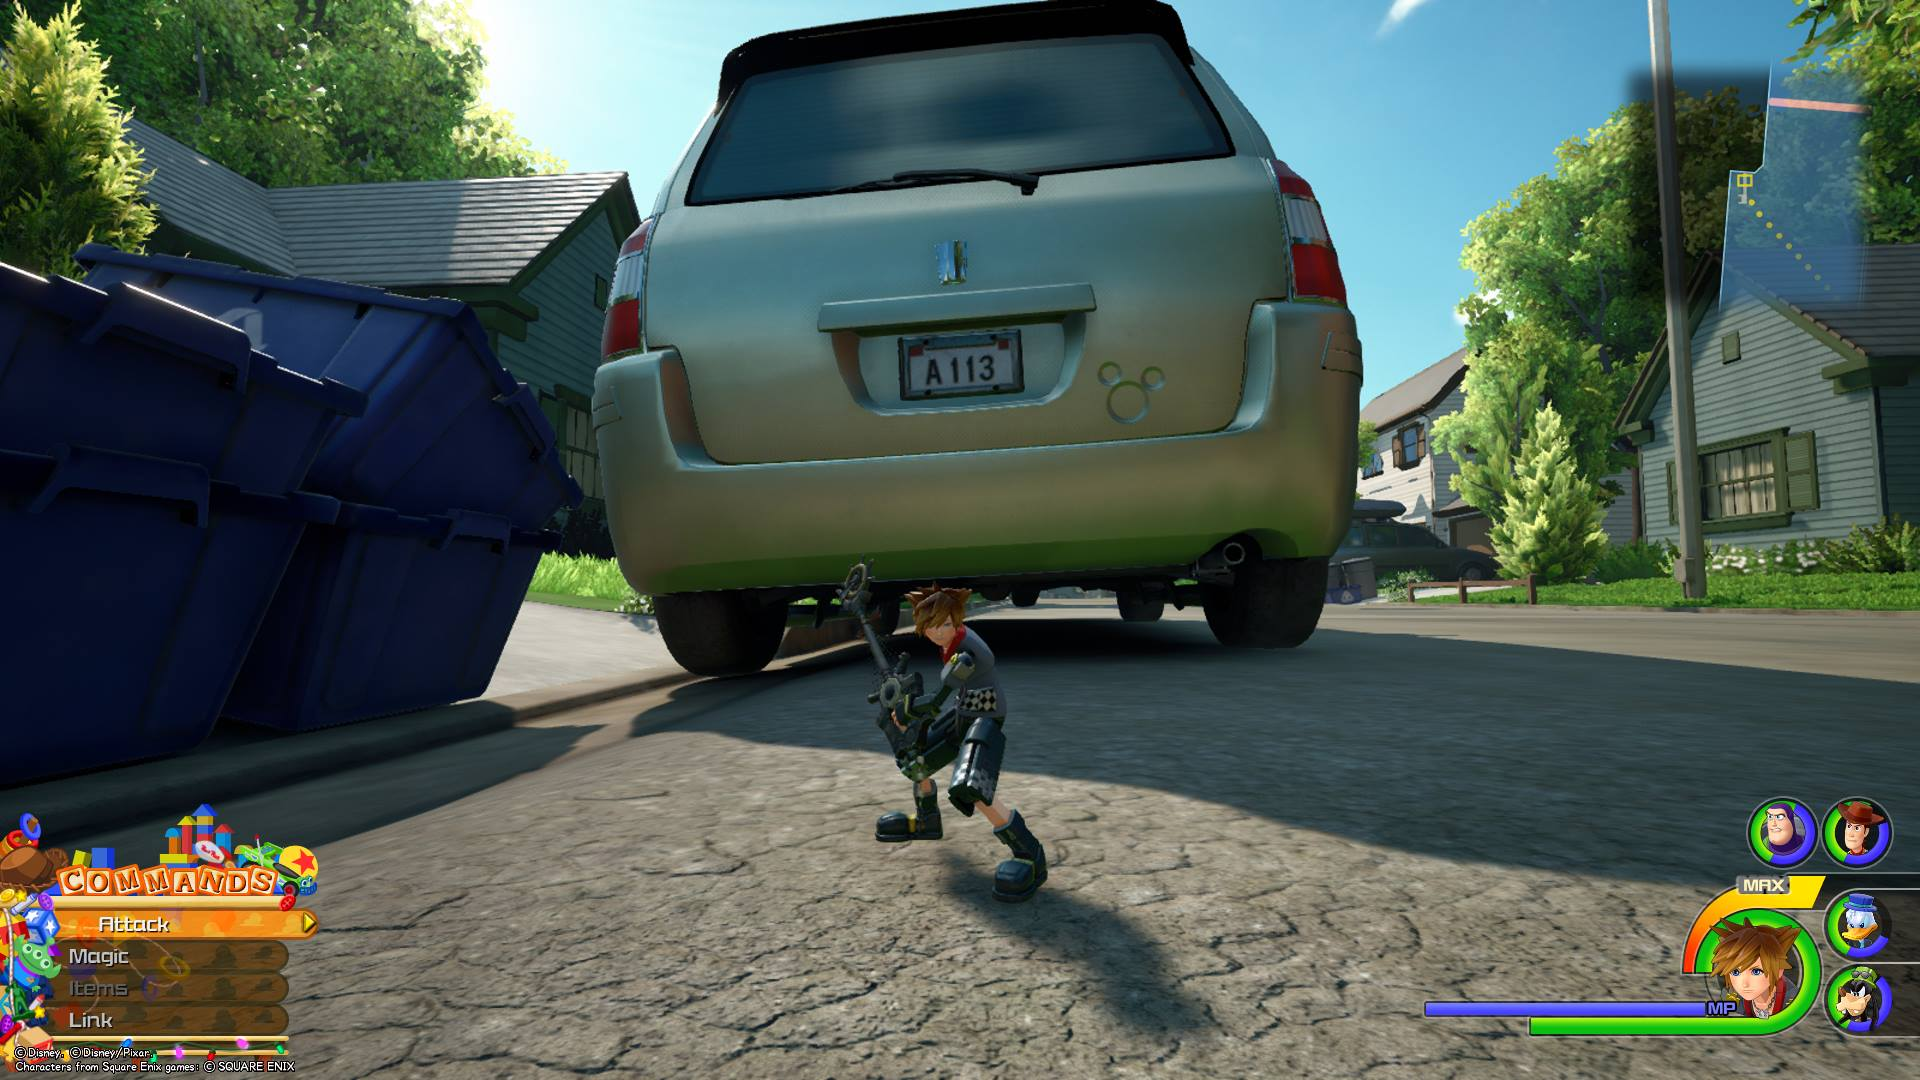 Kingdom Hearts 3 - Toy Box Lucky Emblem 4